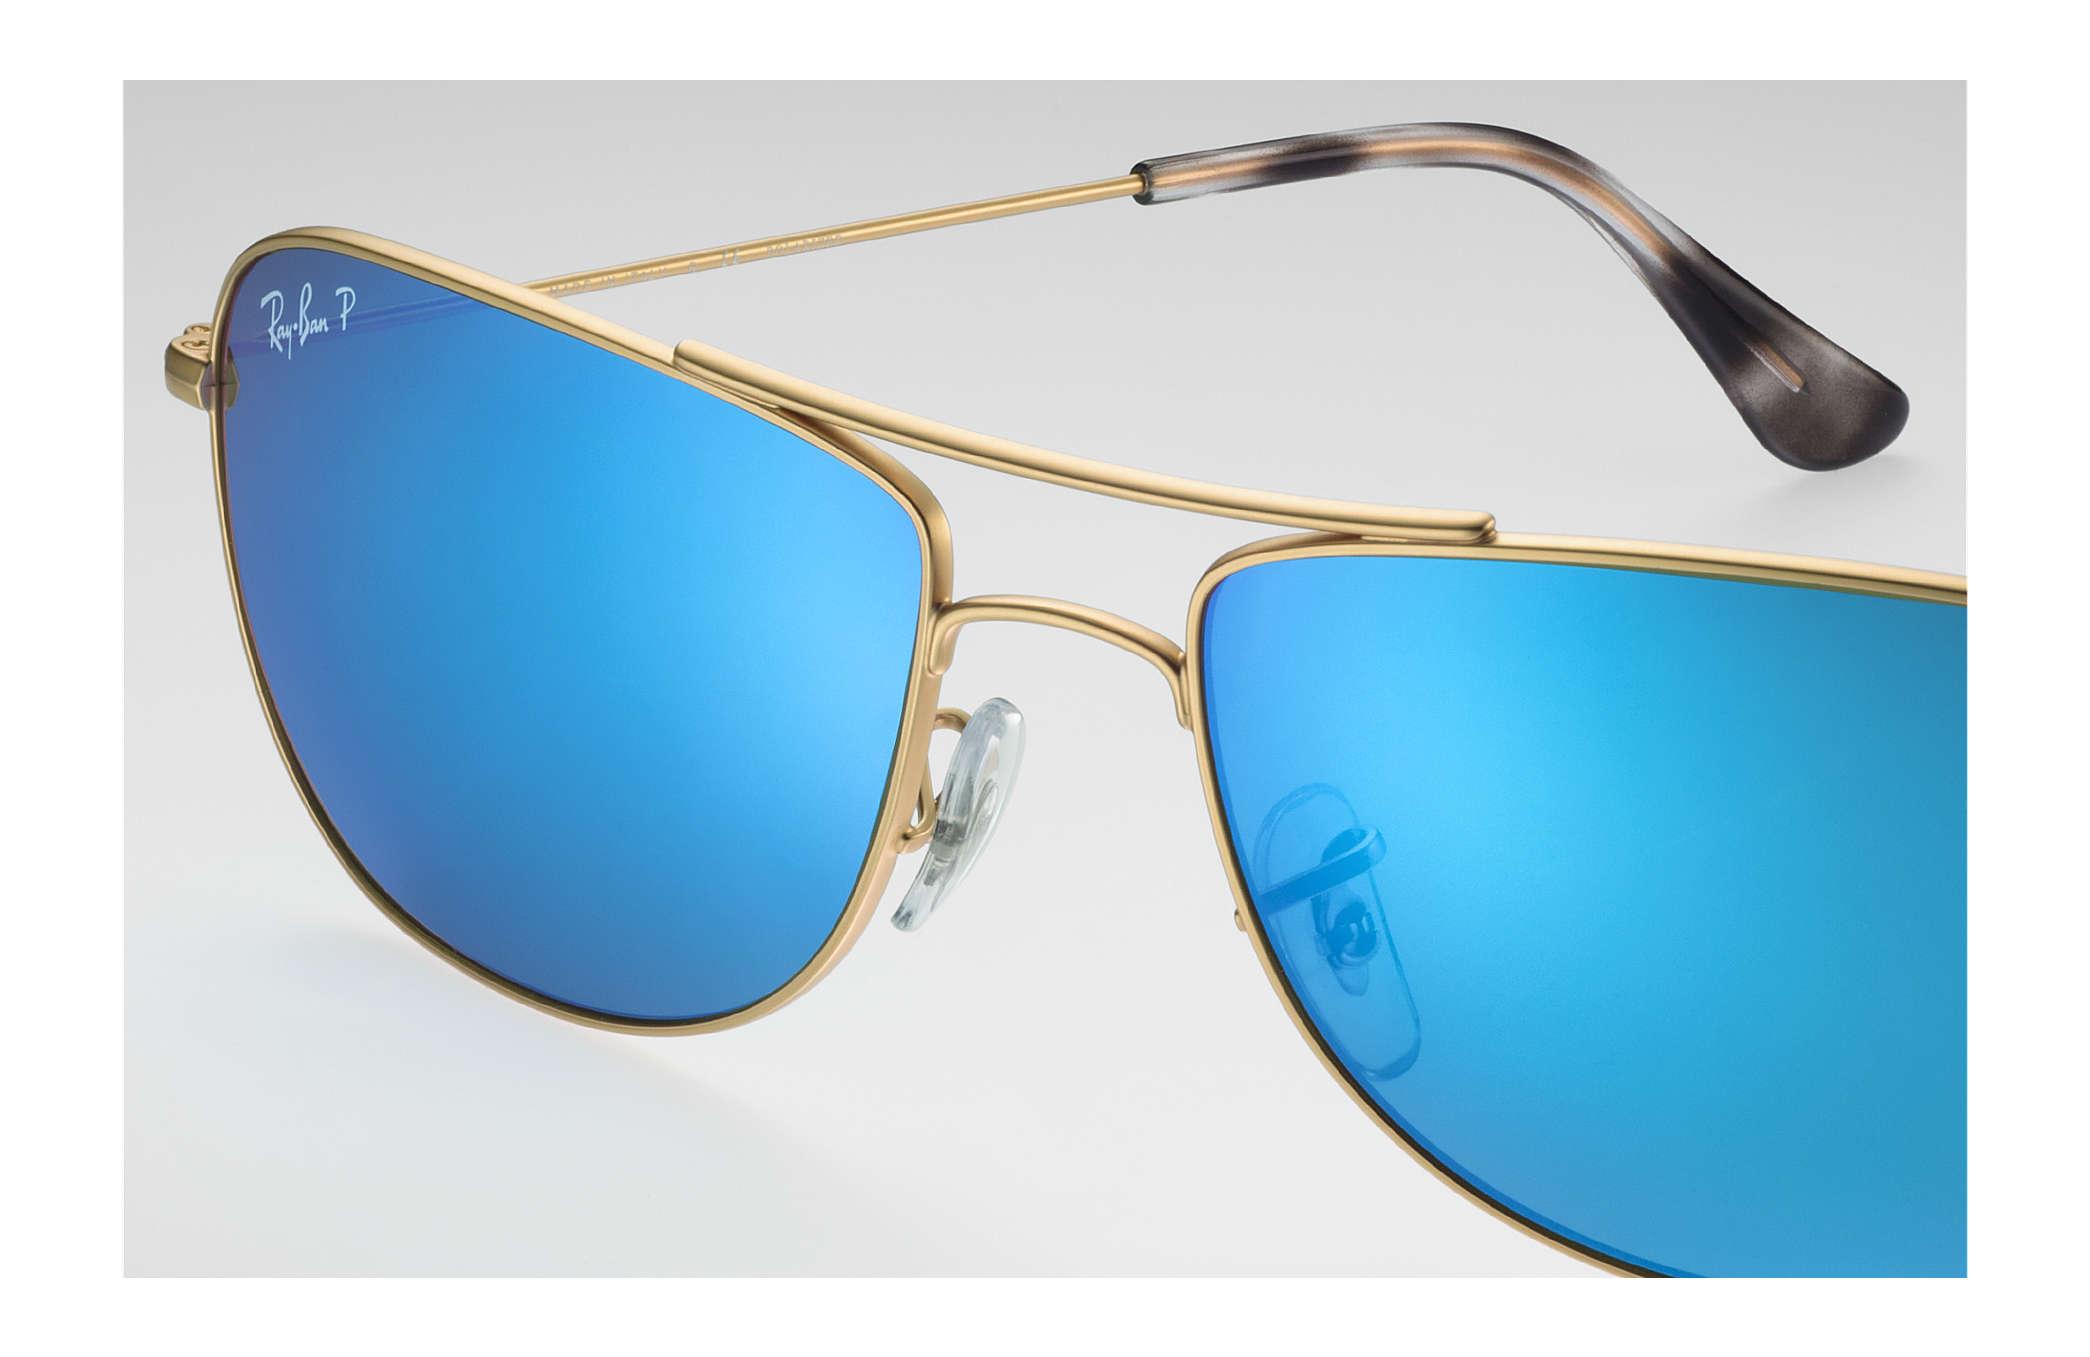 8452ede900 Ray-Ban Rb3543 Chromance RB3543 Gold - Metal - Blue Polarized Lenses ...